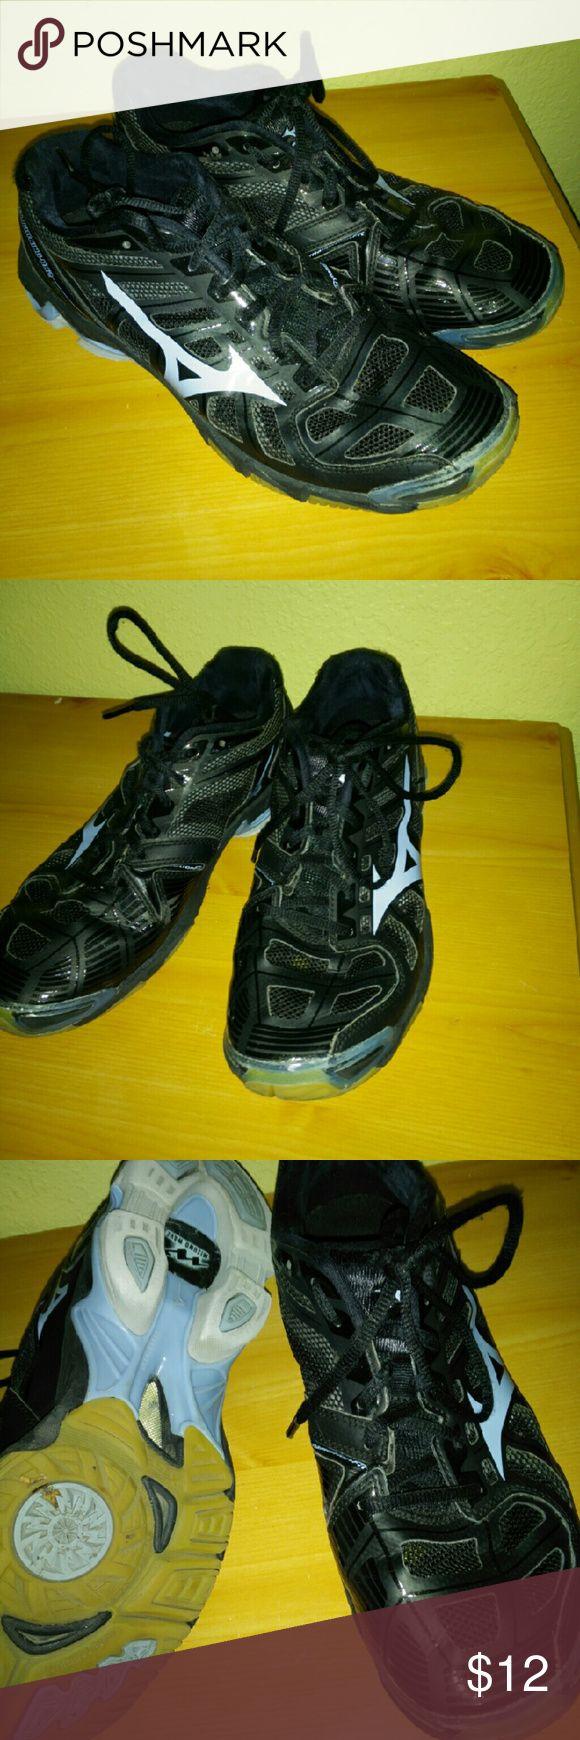 MIZUNO WAVE ladies sneakers MIZUNO.WAVE ladies sneakers Black and baby blue color Great shape! Size 10 Mizuno Shoes Sneakers